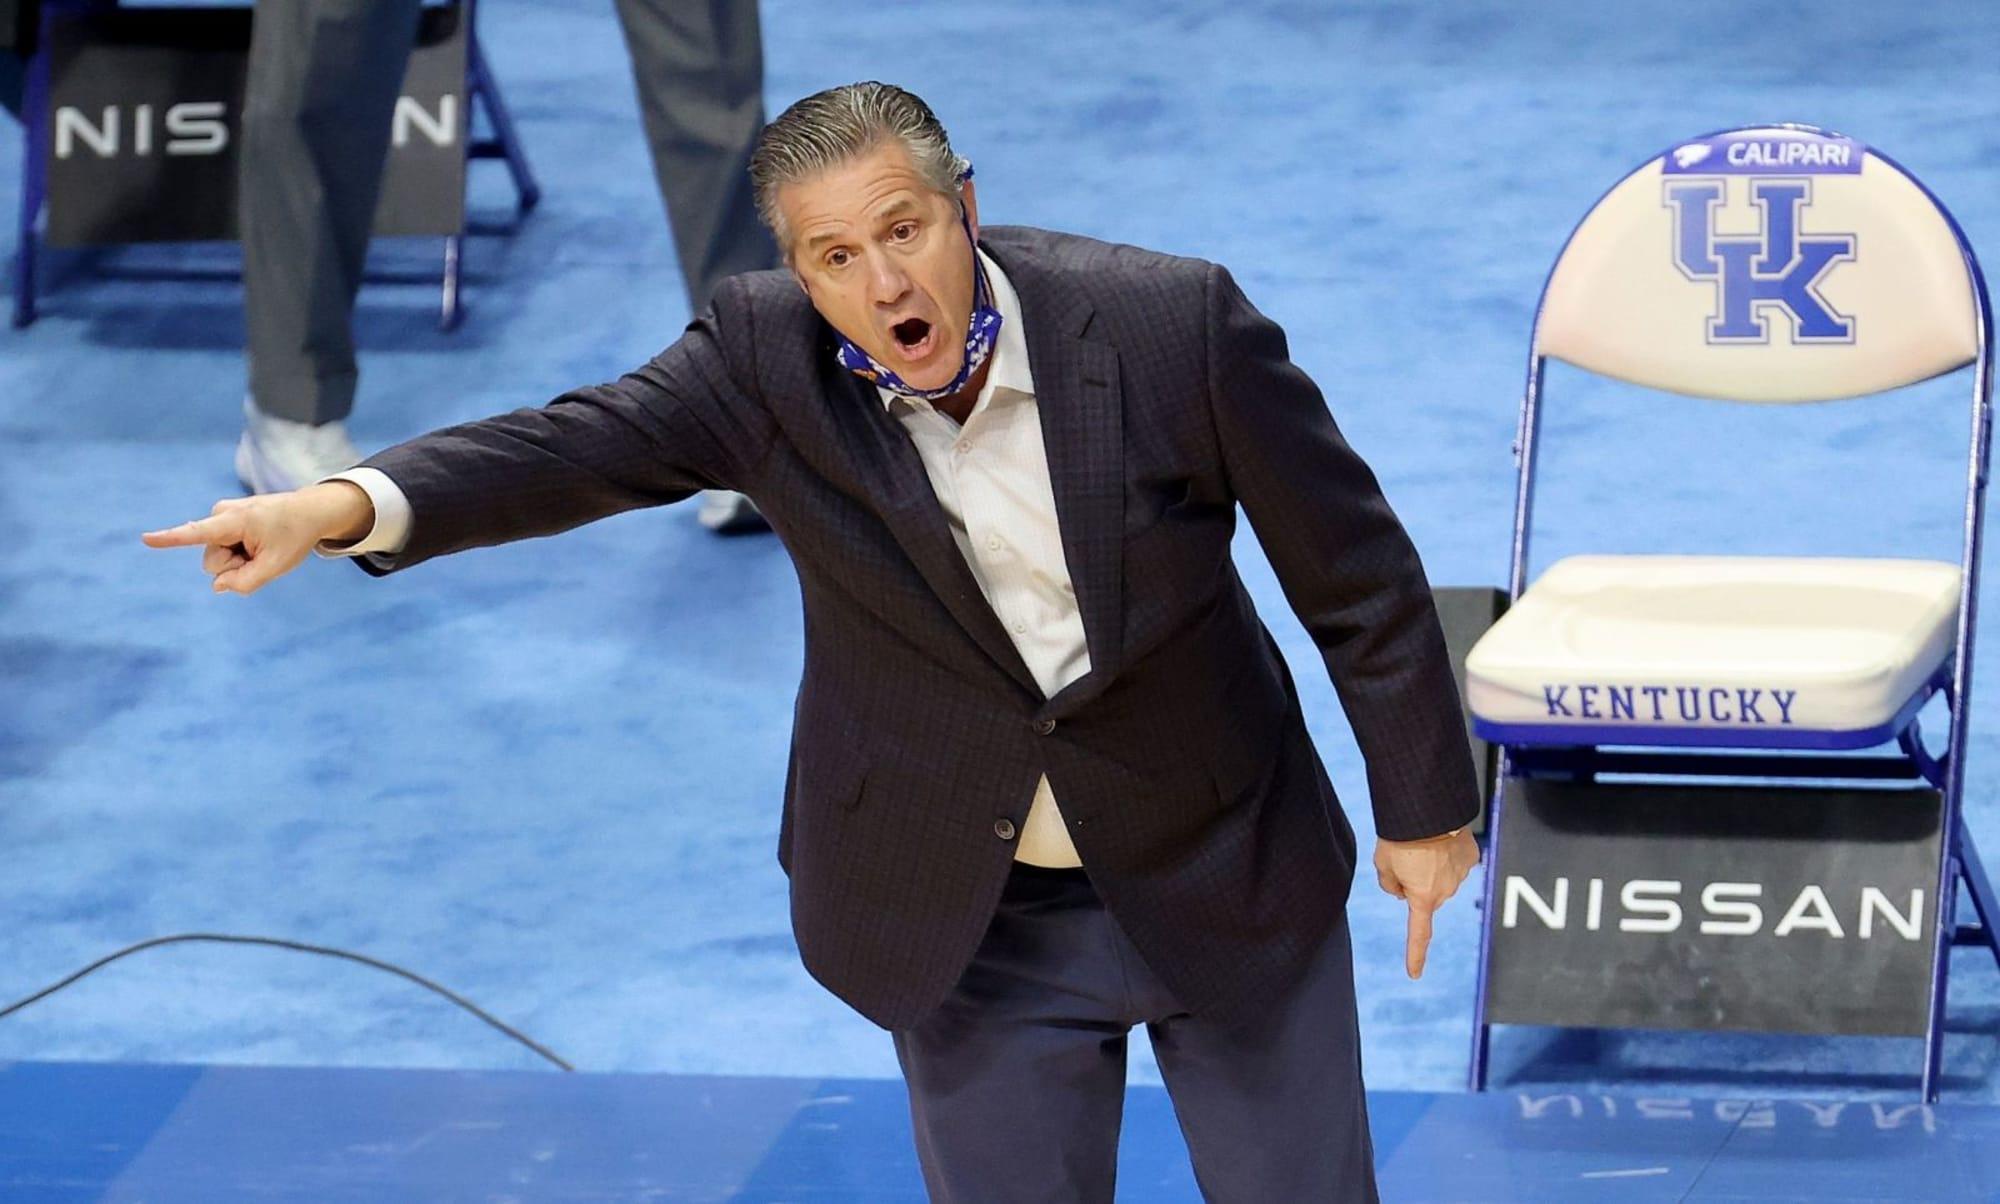 Kentucky basketball: 10 potential replacements for John Calipari